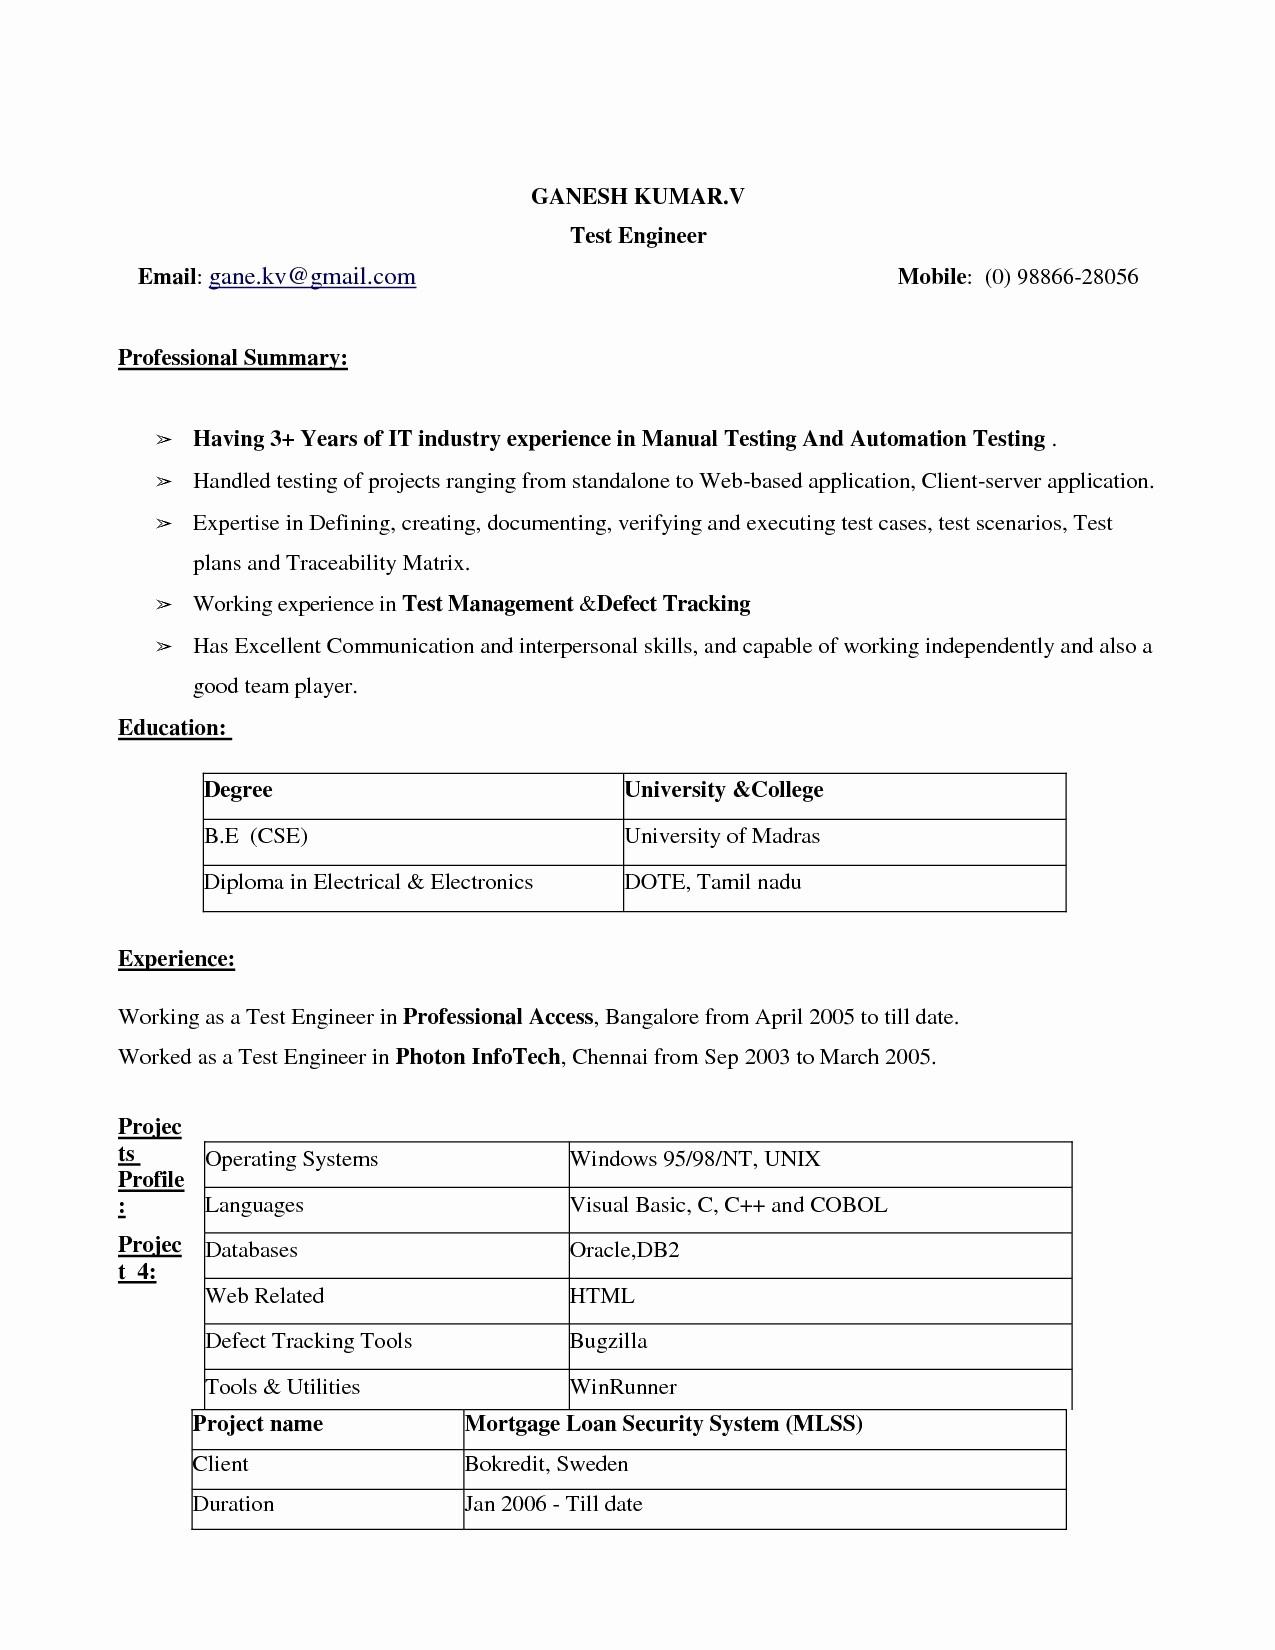 Free Resume Templates 2017 Word Elegant Resume Template Microsoft Word 2017